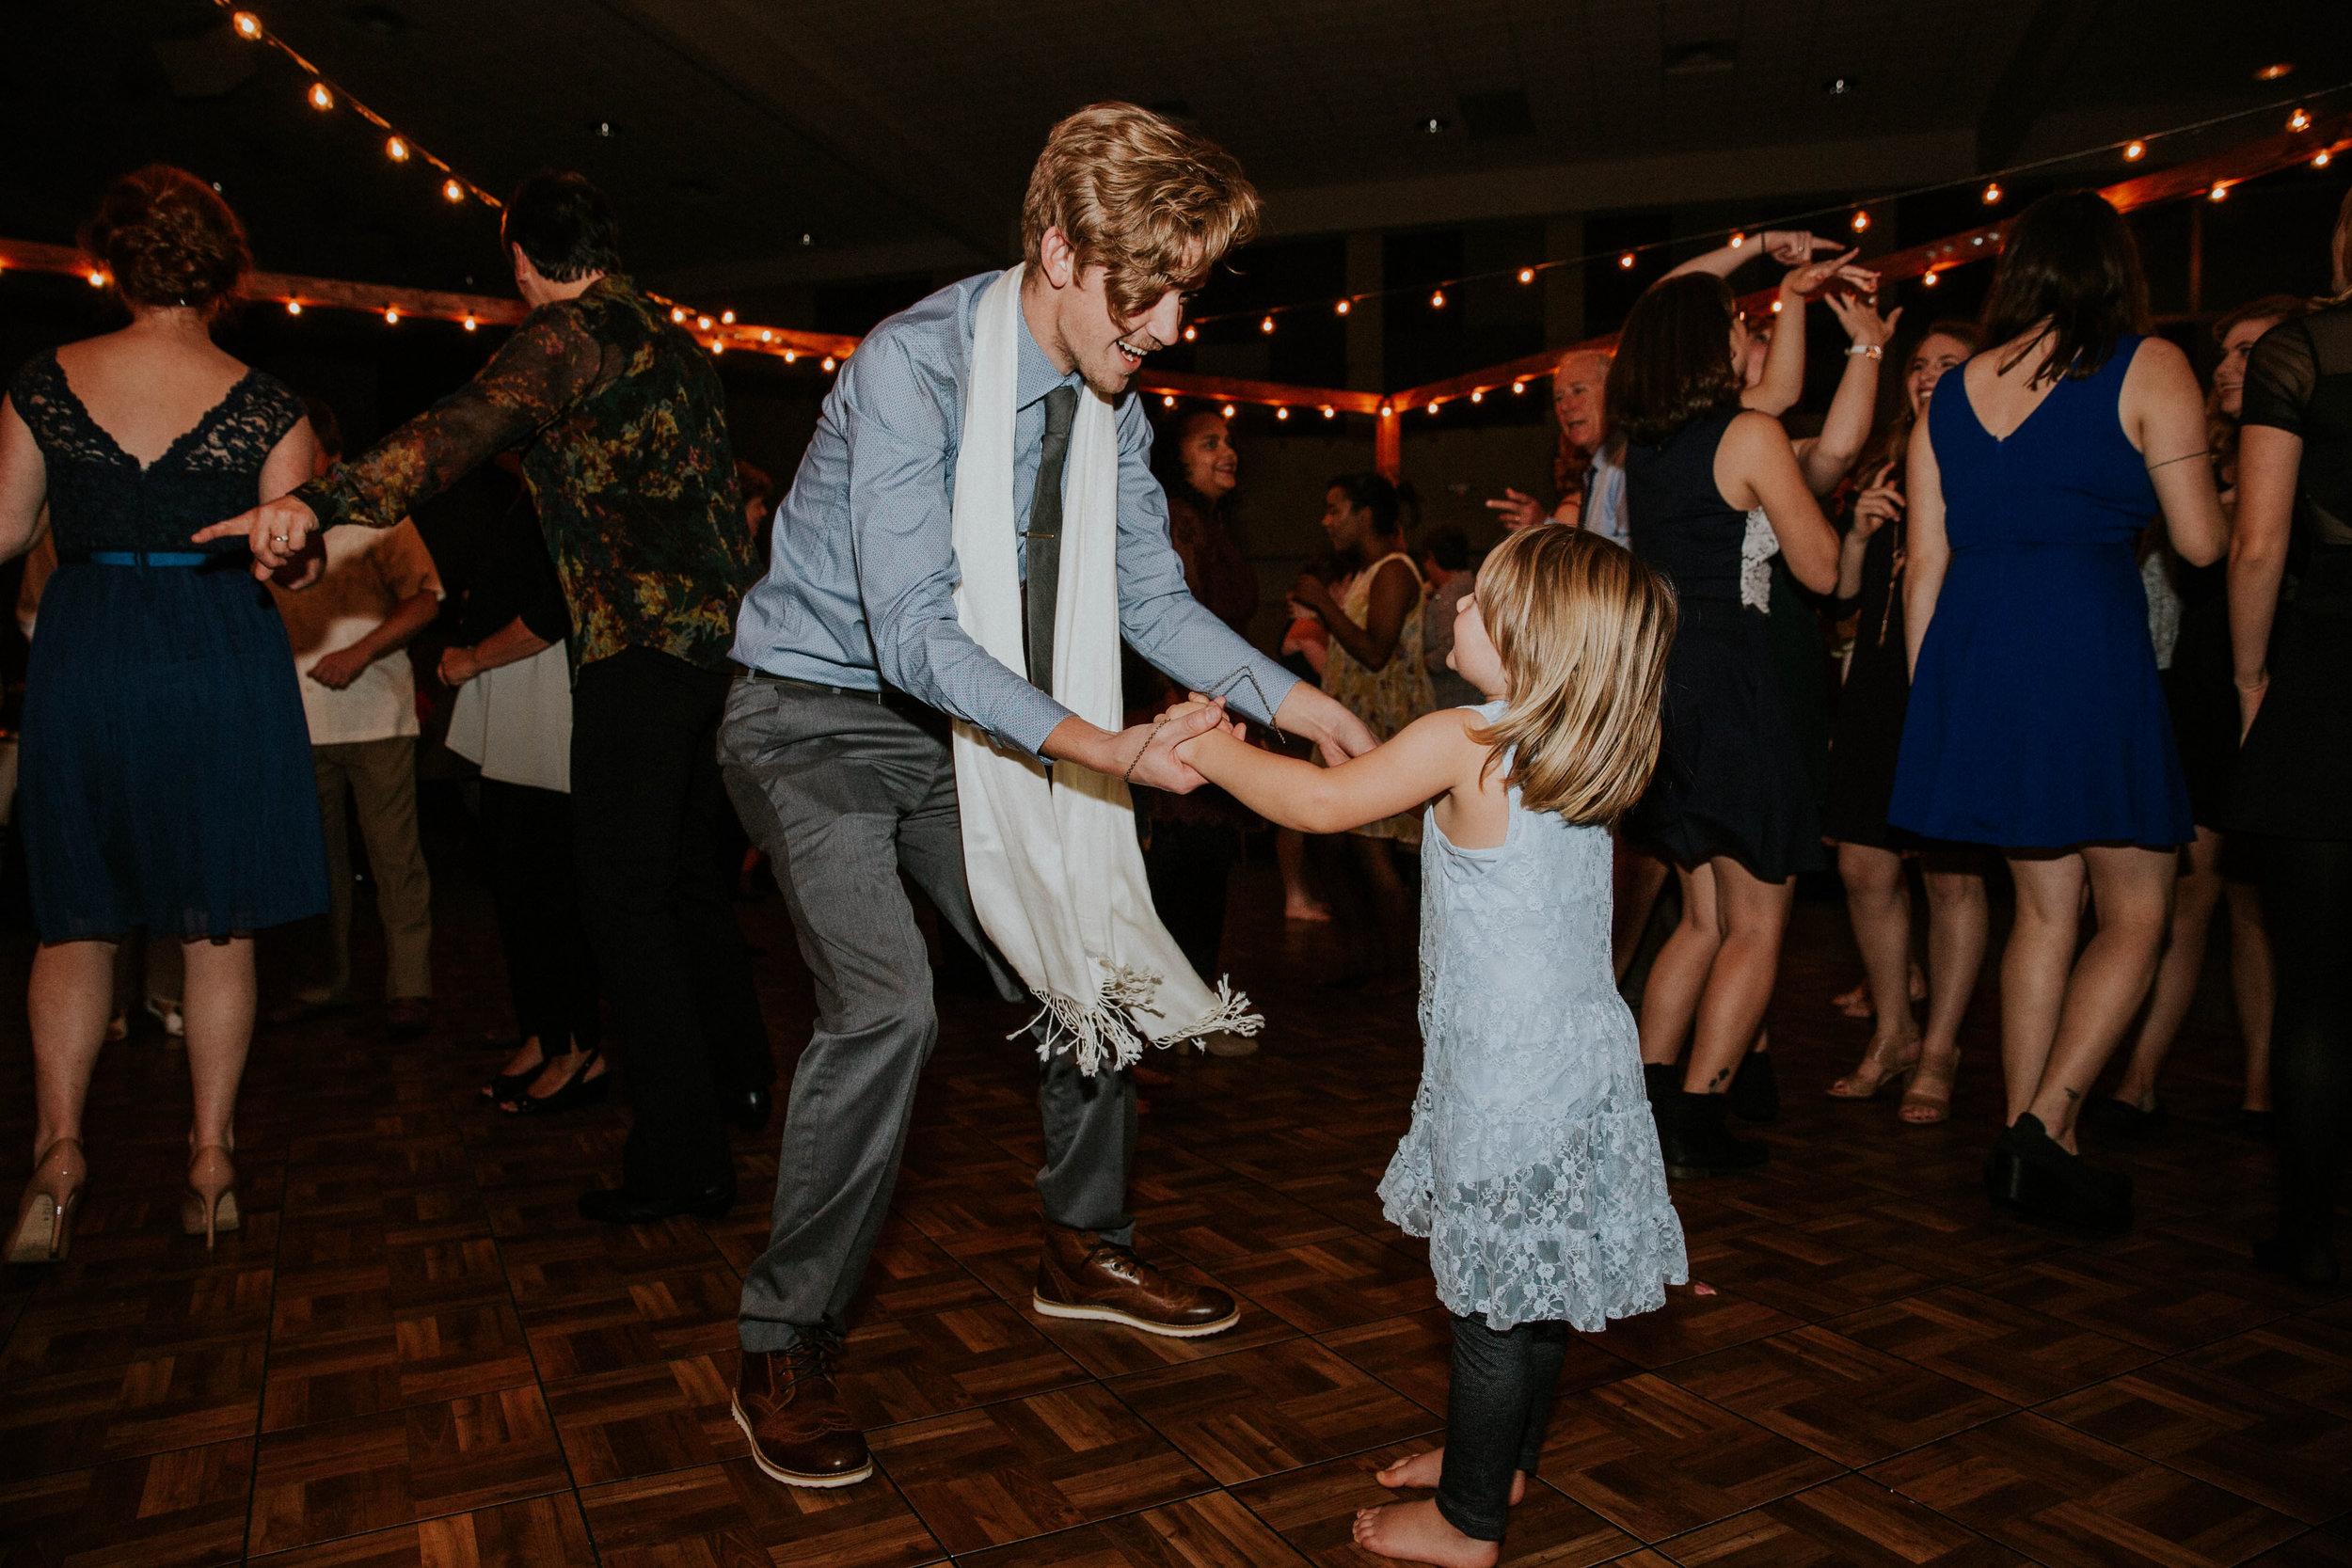 Columbus ohio wedding photographer grace e jones photography real fun joyful wedding150.jpg